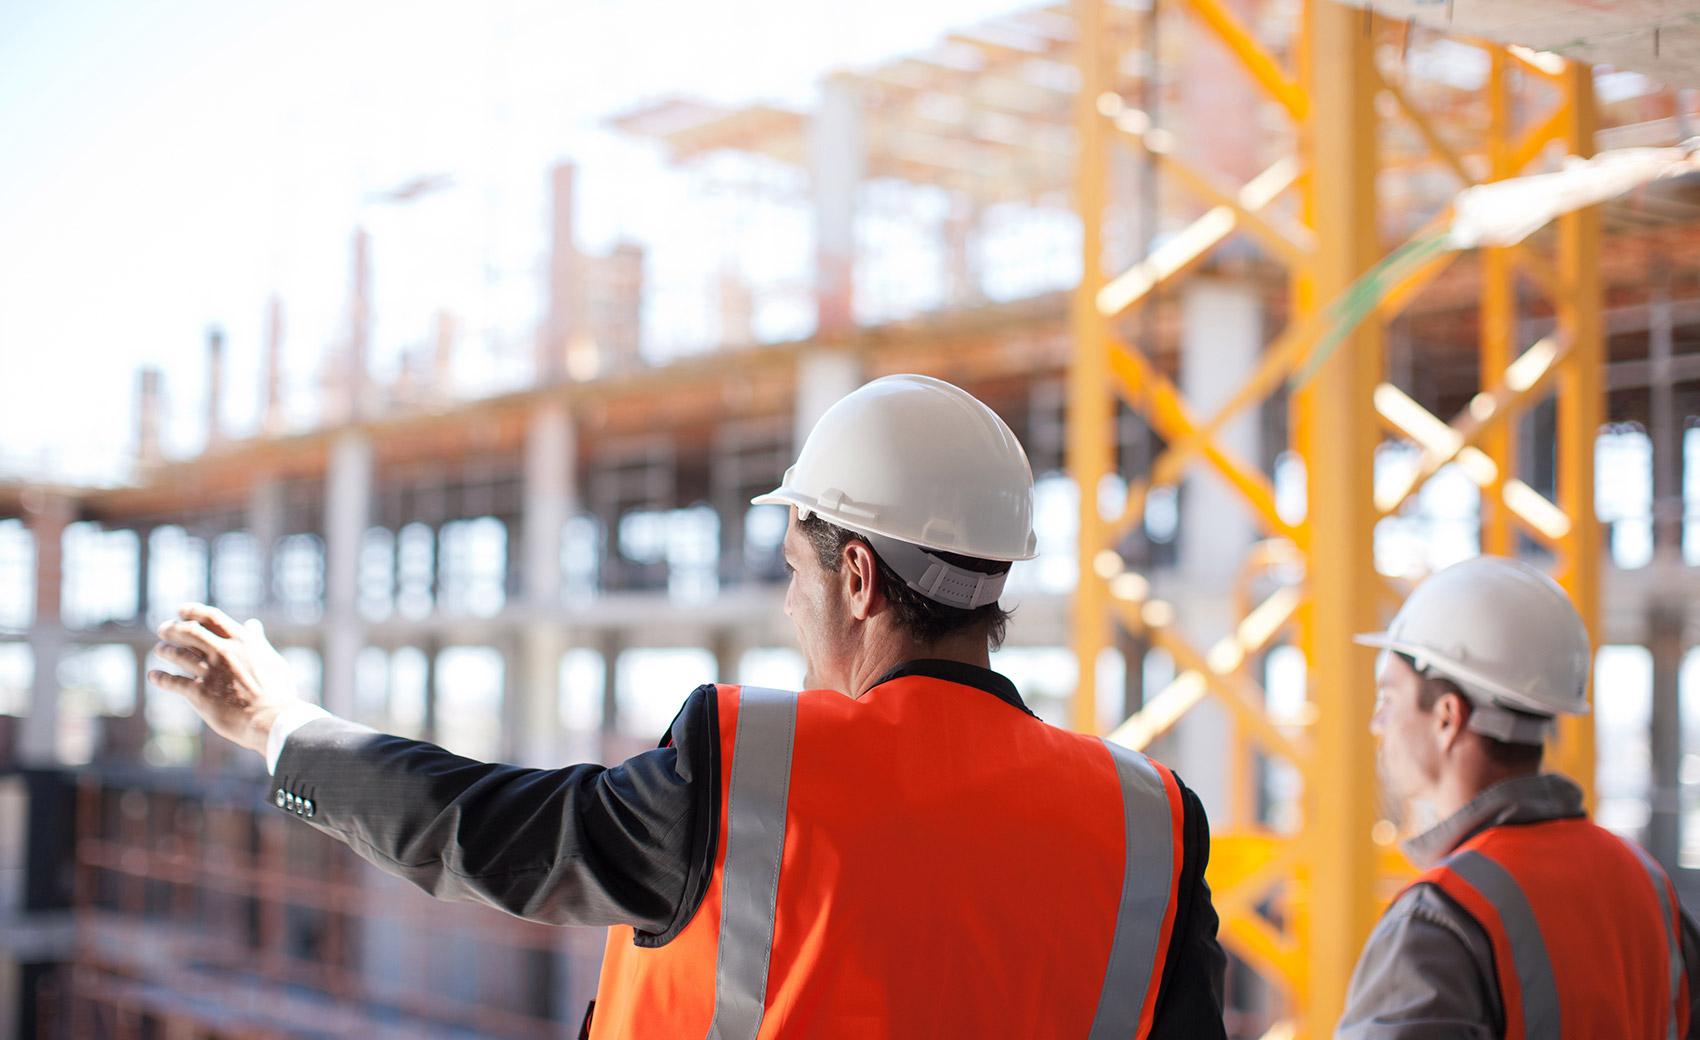 Meet the robots helping to assemble scaffolding — Roland Berger